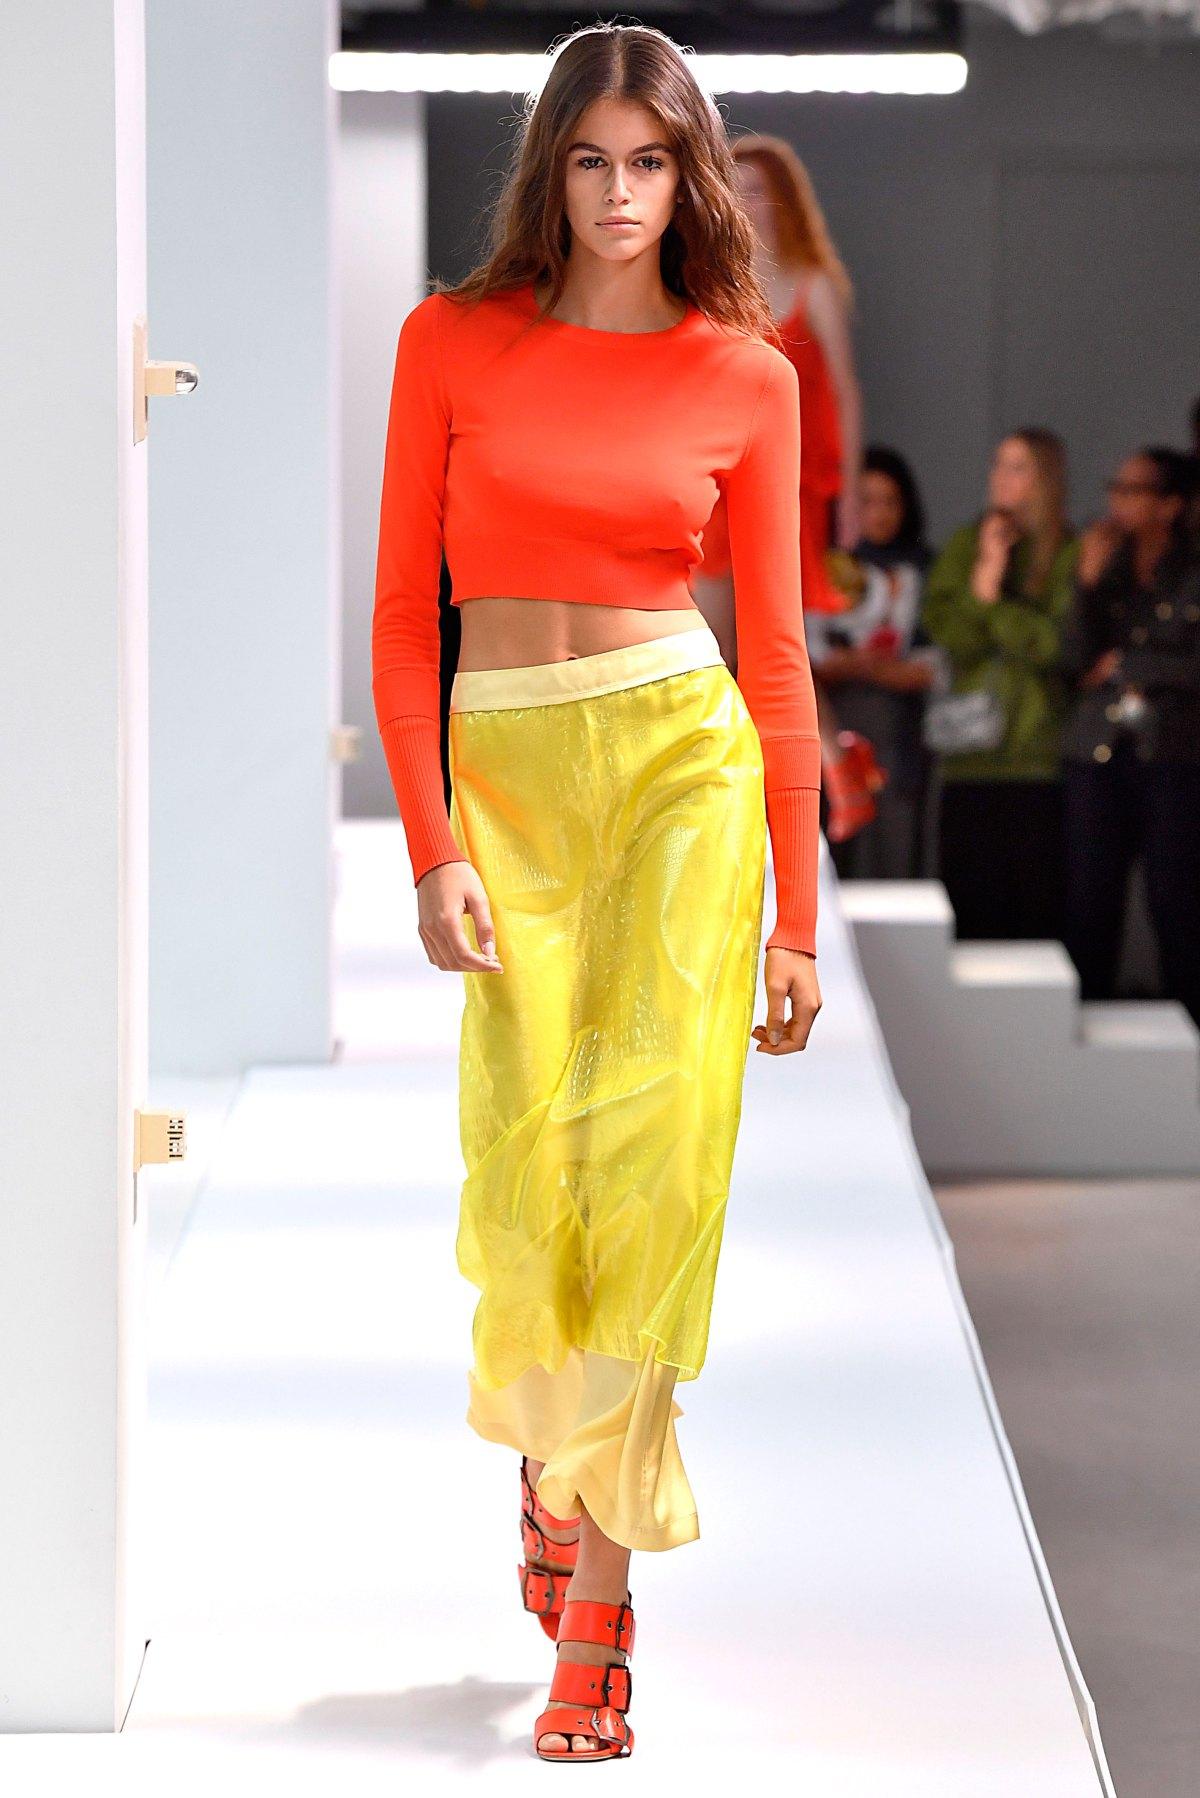 Kaia Gerber's Best Fashion Week, Runway Moments: Pics